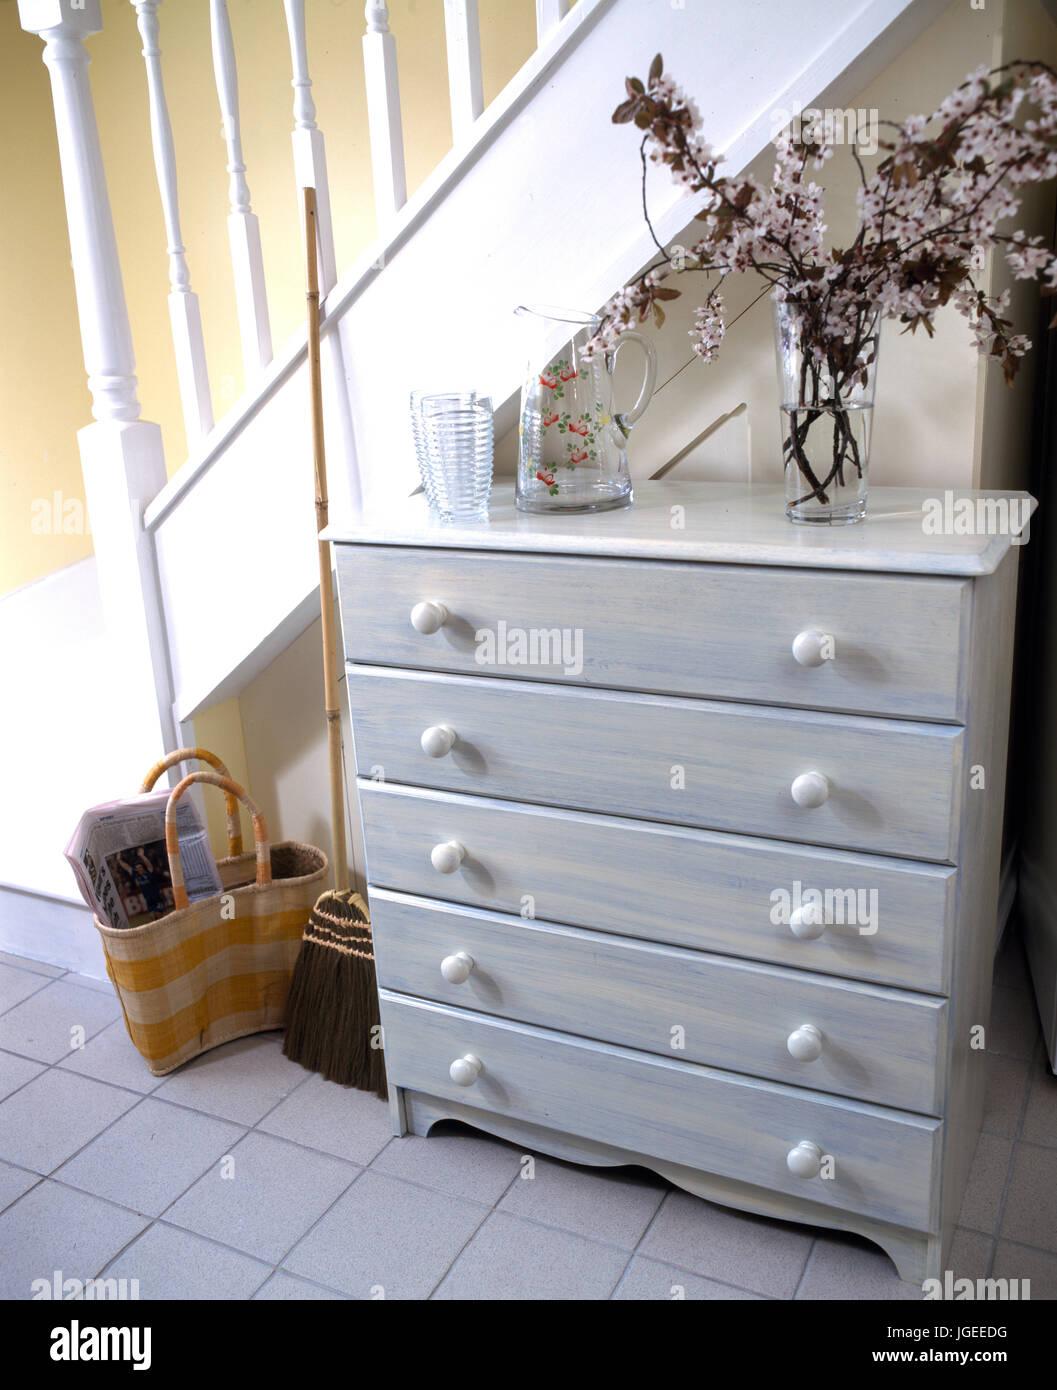 Muebles de cajones de madera pintado para coincidir con azulejos pasillo foto imagen de stock - Muebles de pasillo ...